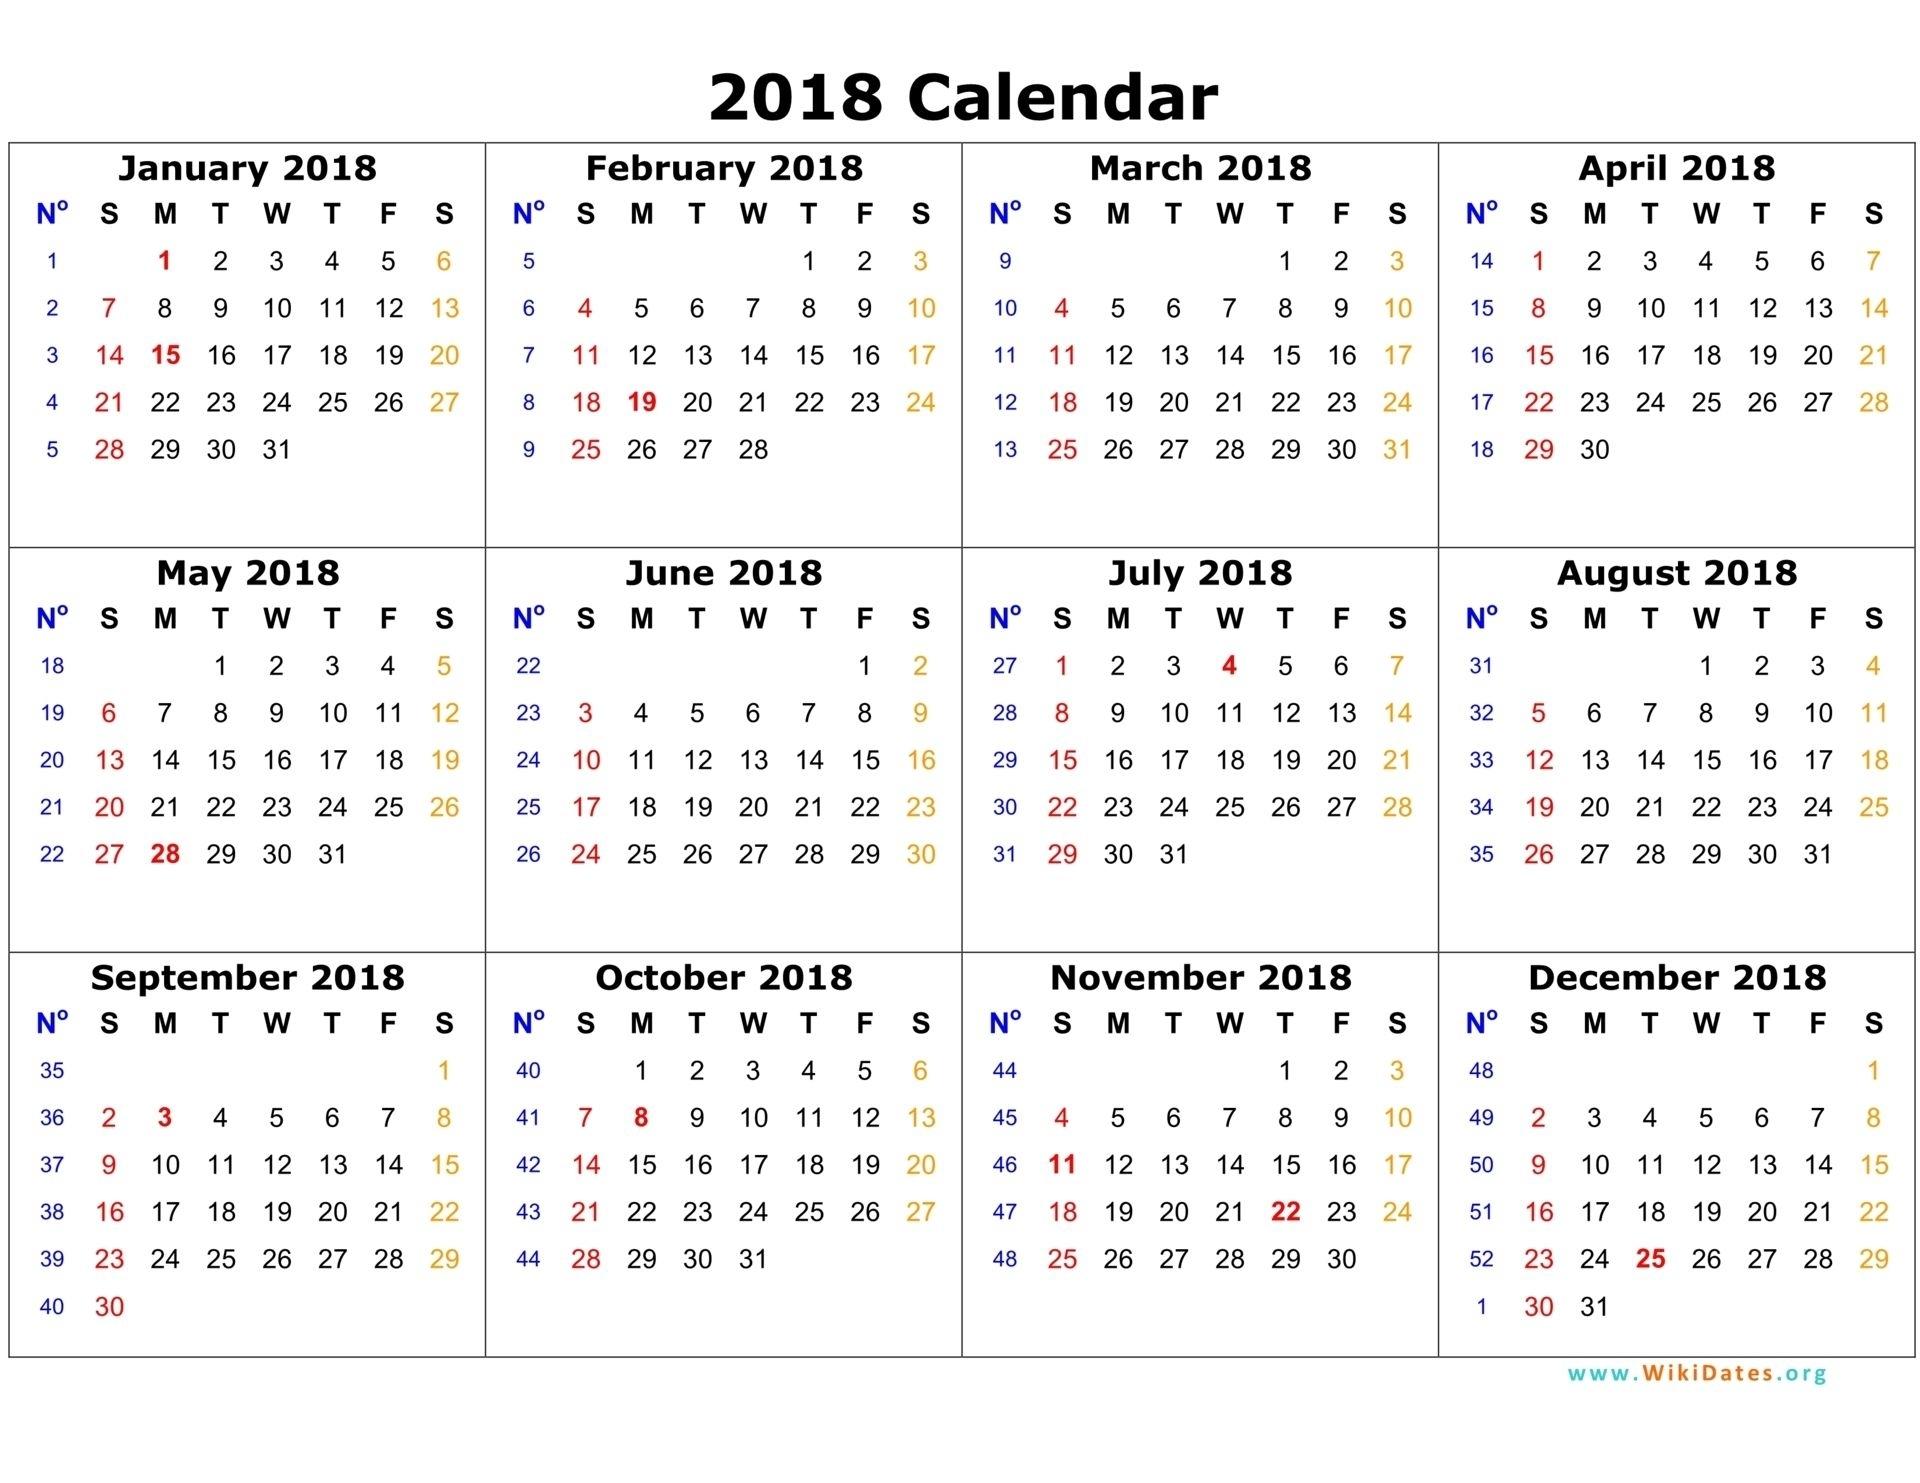 2018 Calendar On One Page | Calendar Template 2016 | Planner Stuff regarding Blank 12 Month Calendar Page